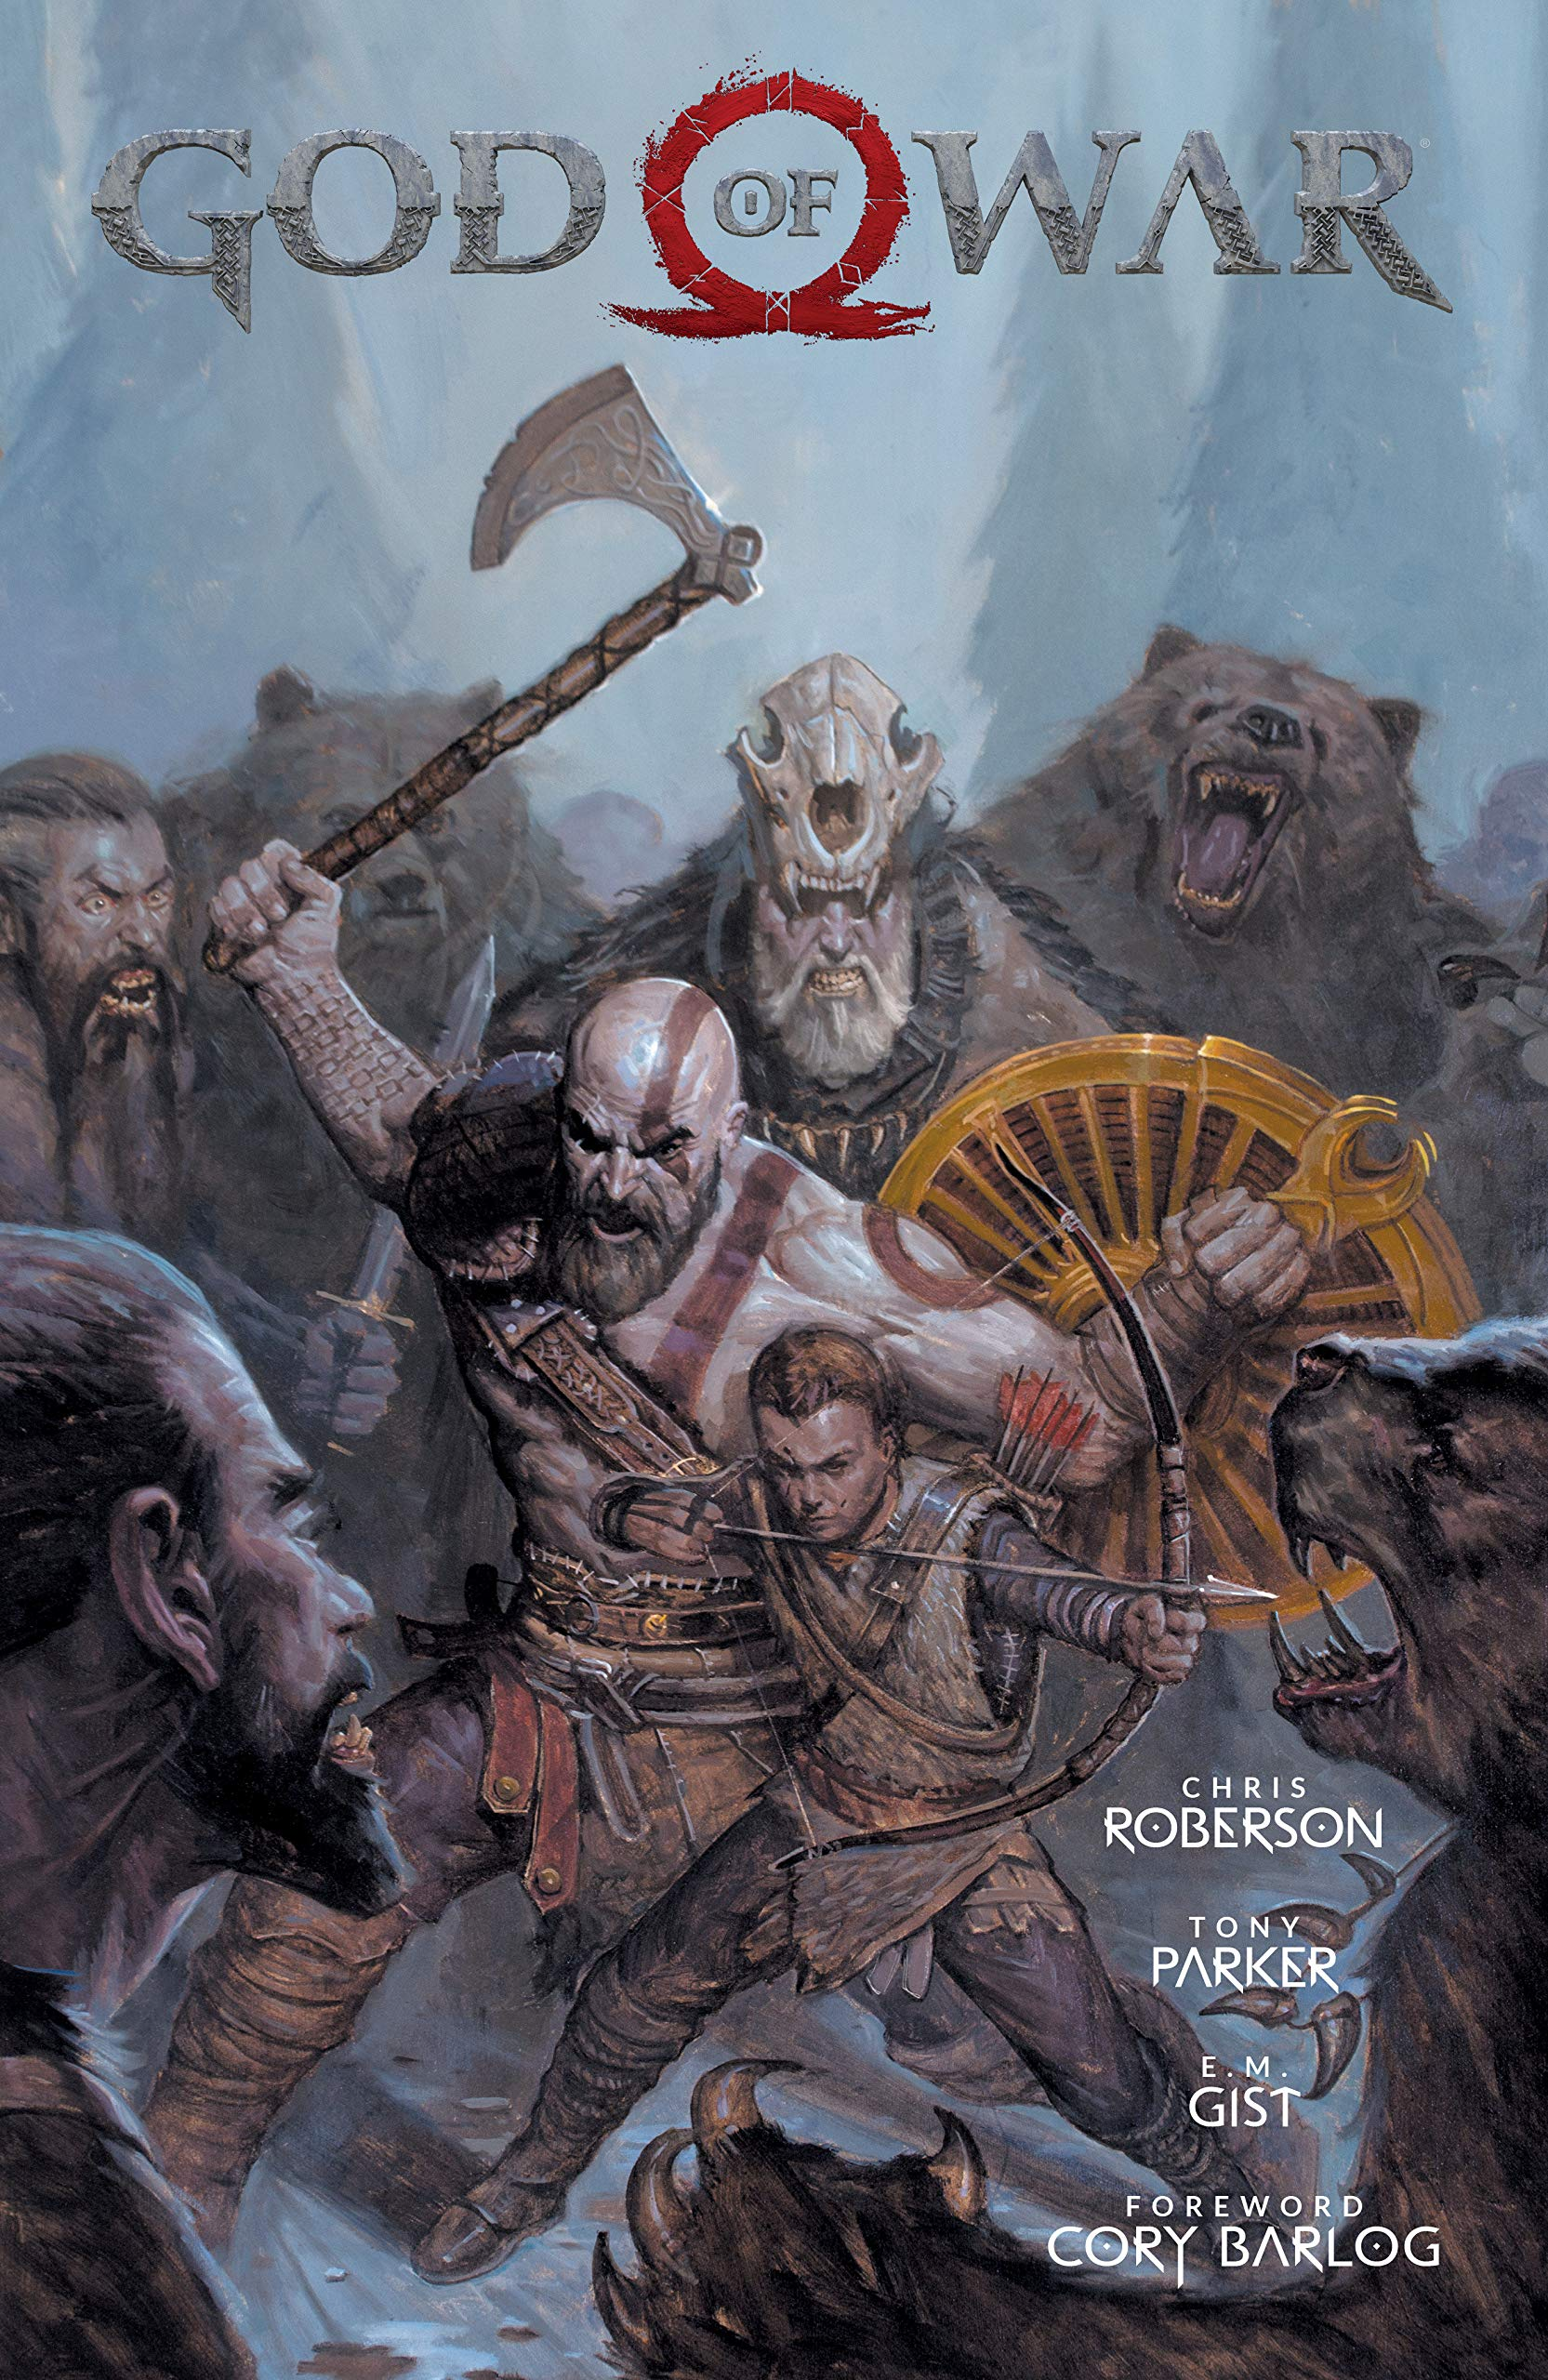 God of War: Roberson, Chris, Parker, Tony: 9781506707464: Amazon.com: Books